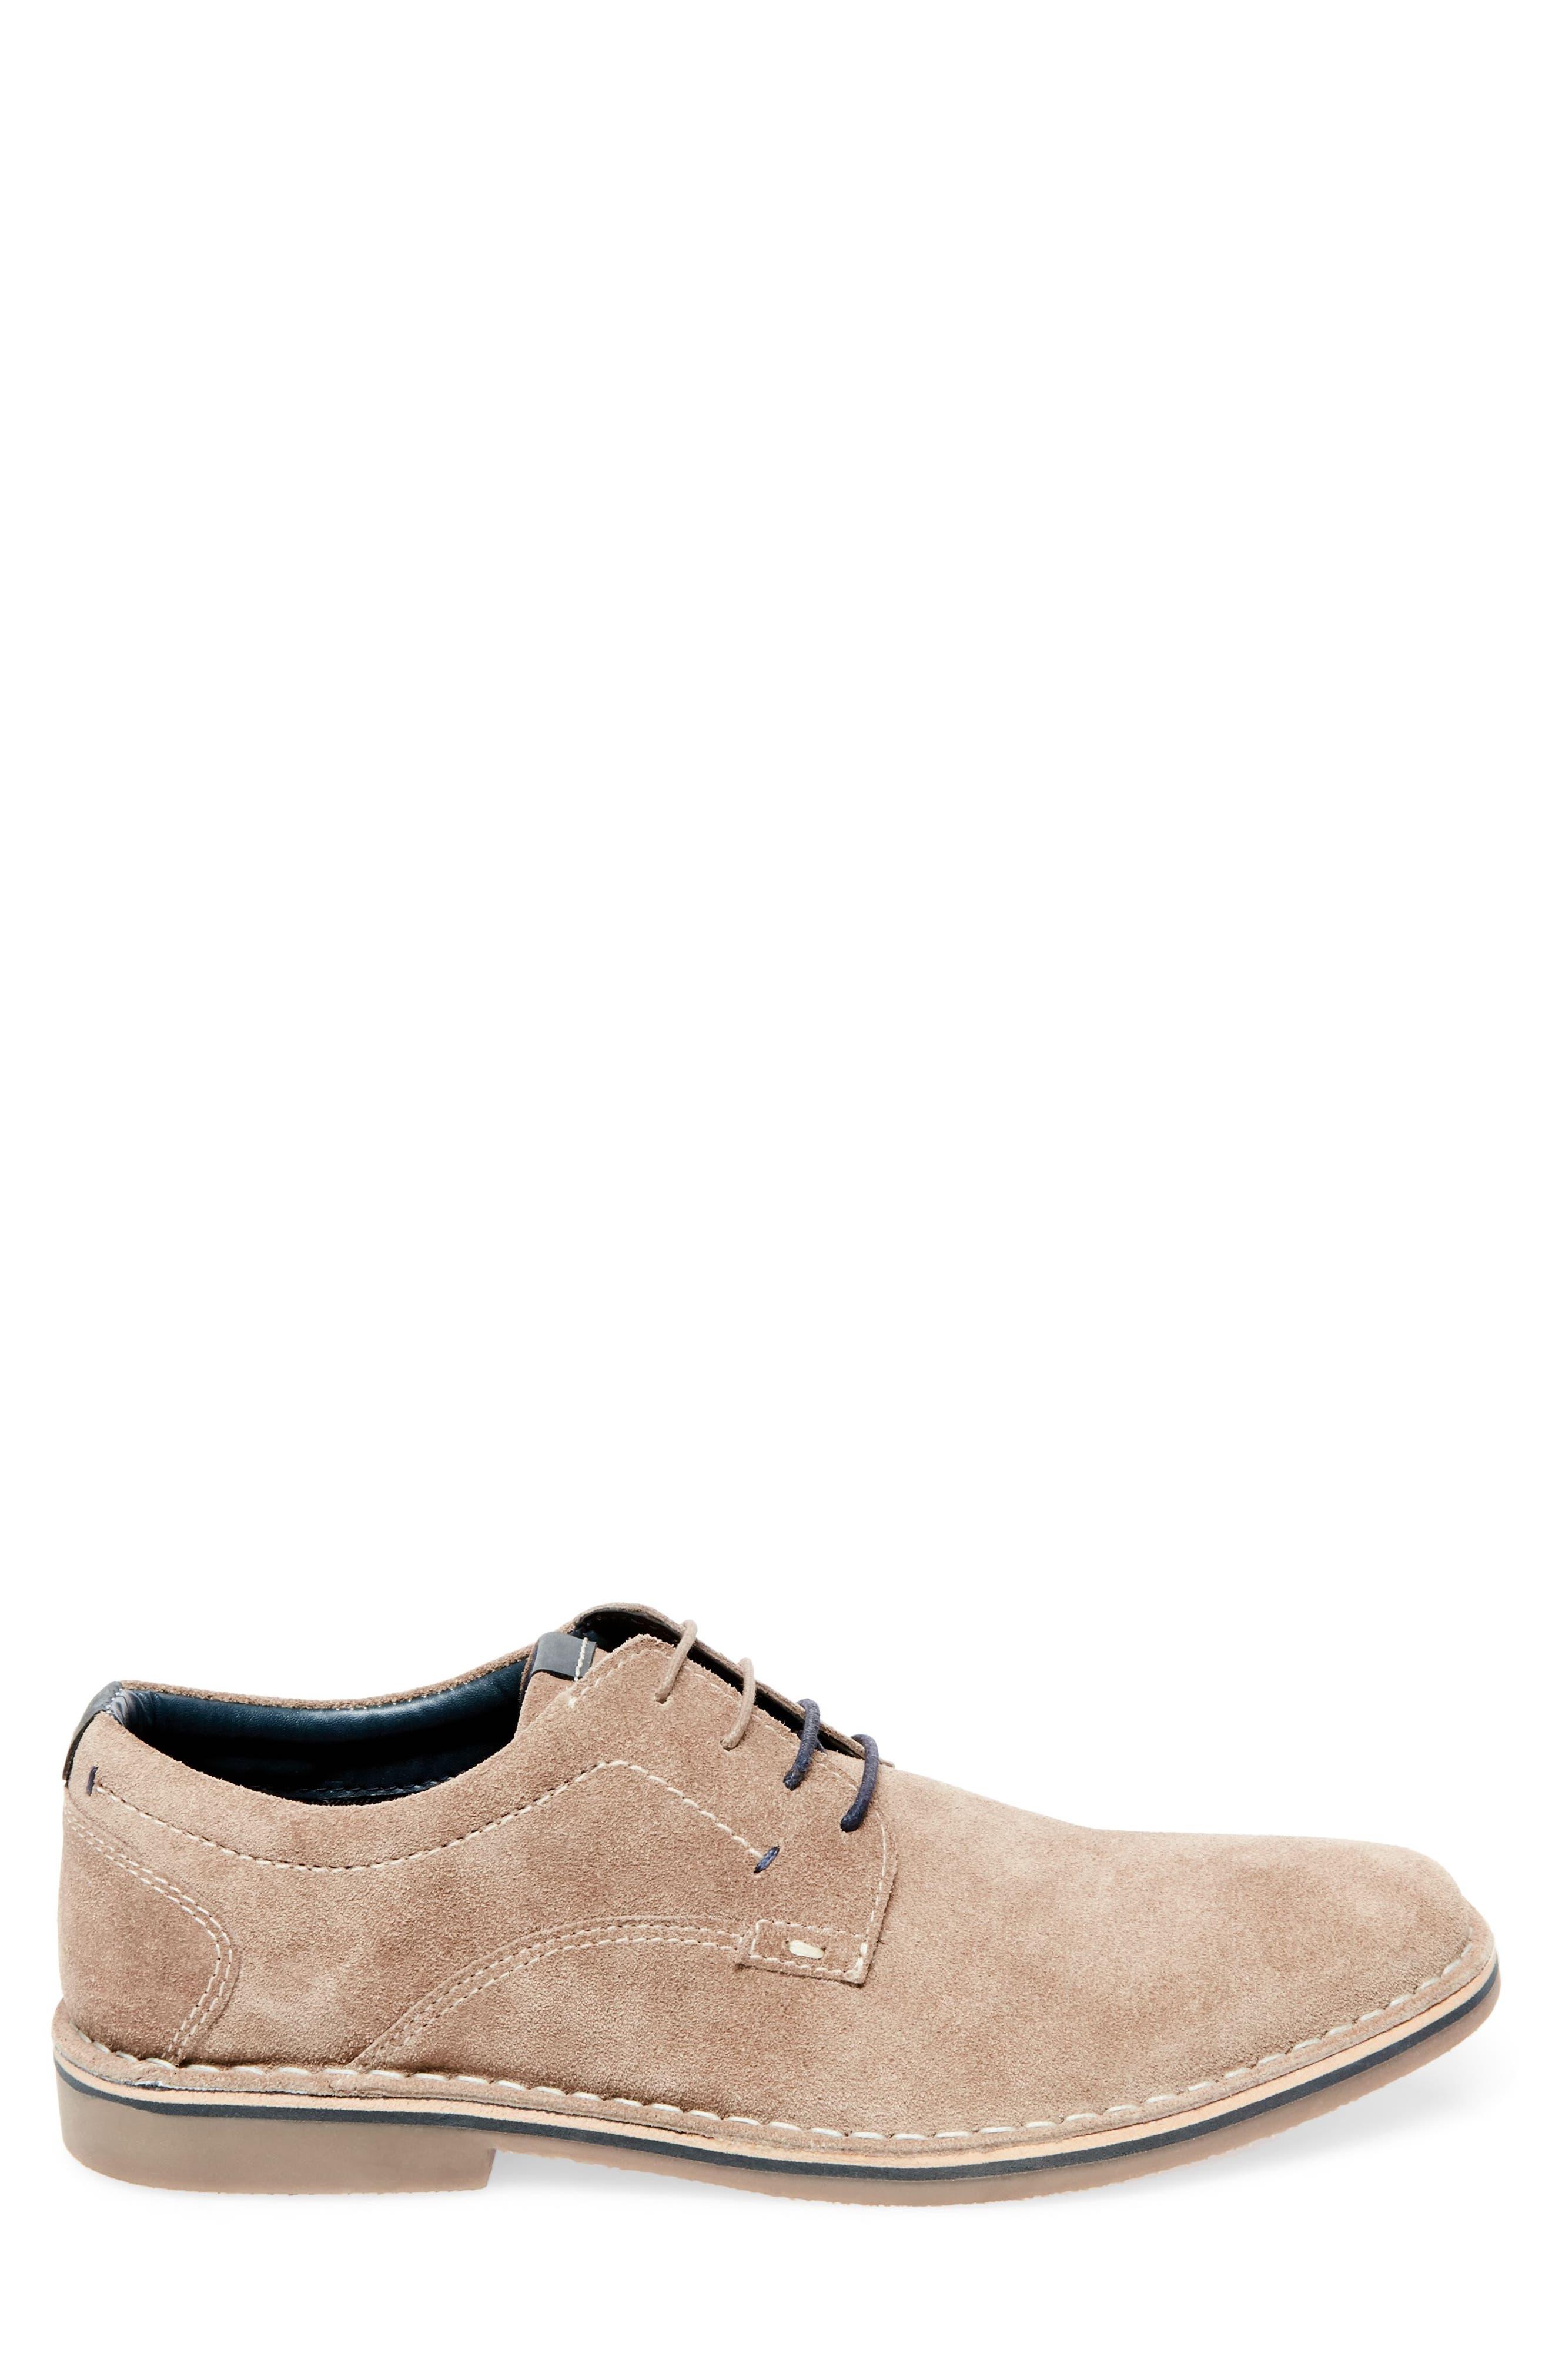 Hatrick Buck Shoe,                             Alternate thumbnail 3, color,                             Taupe Suede